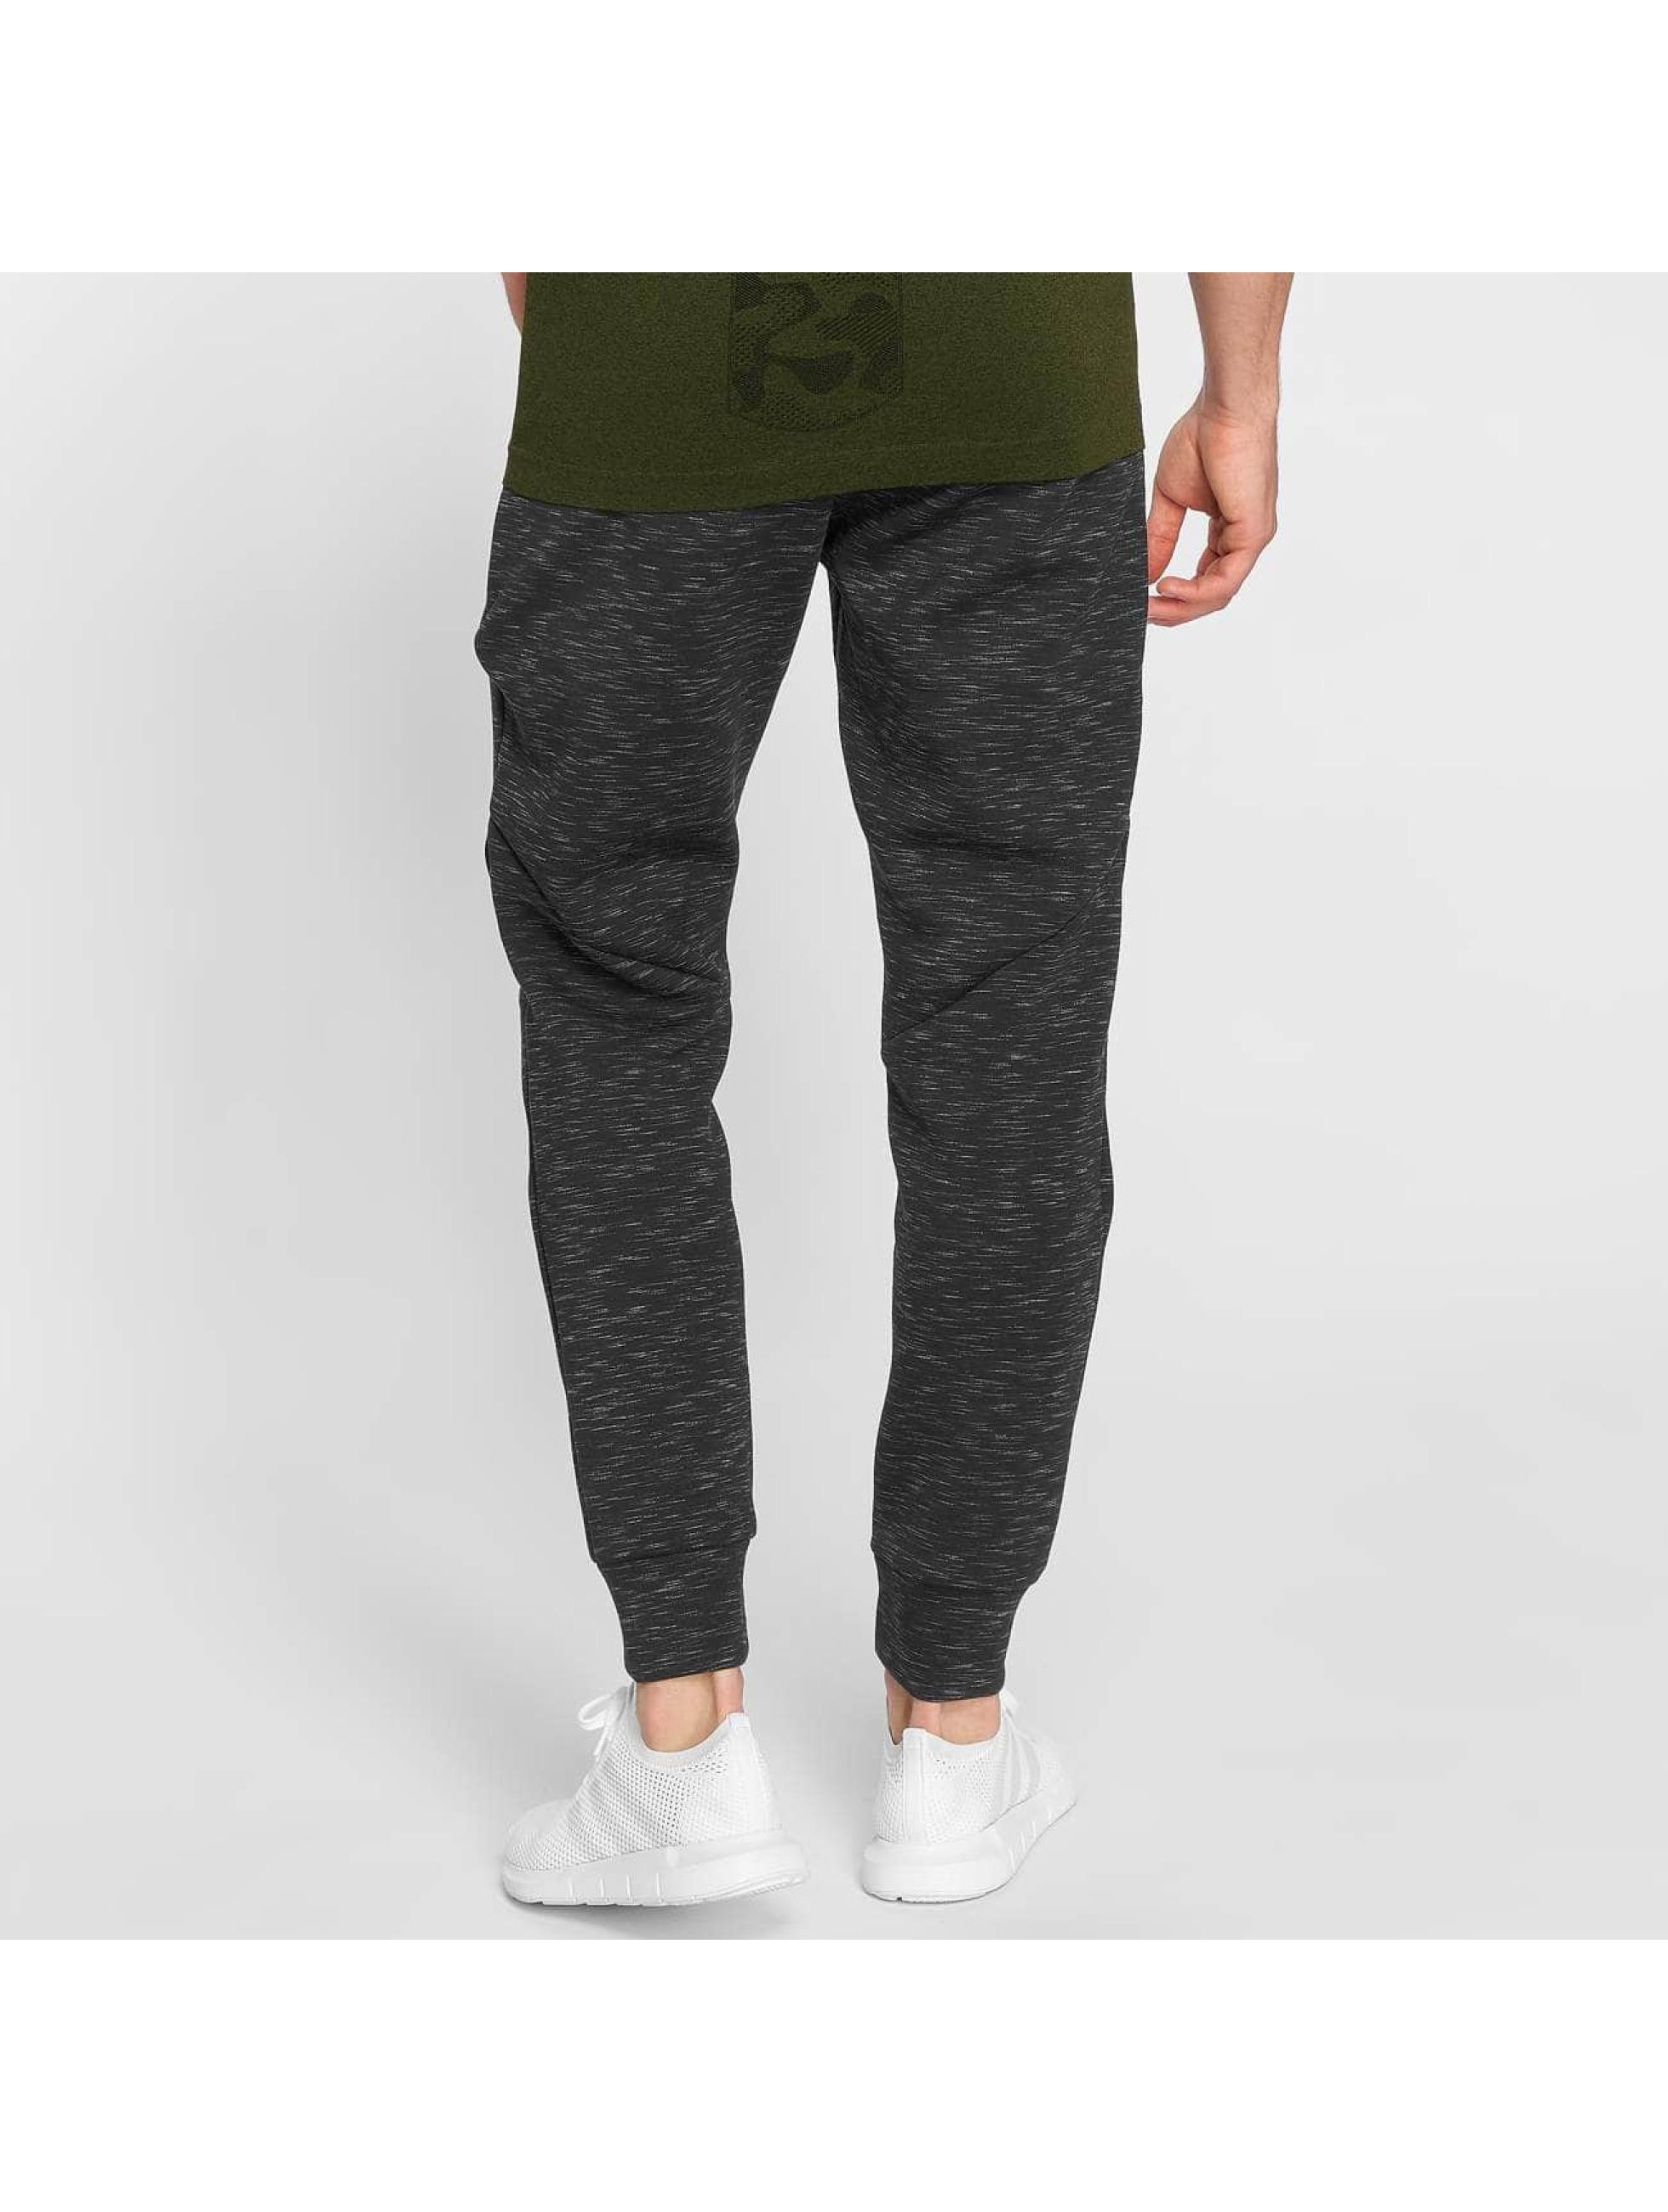 GymCodes Spodnie do joggingu Athletic-Fit czarny